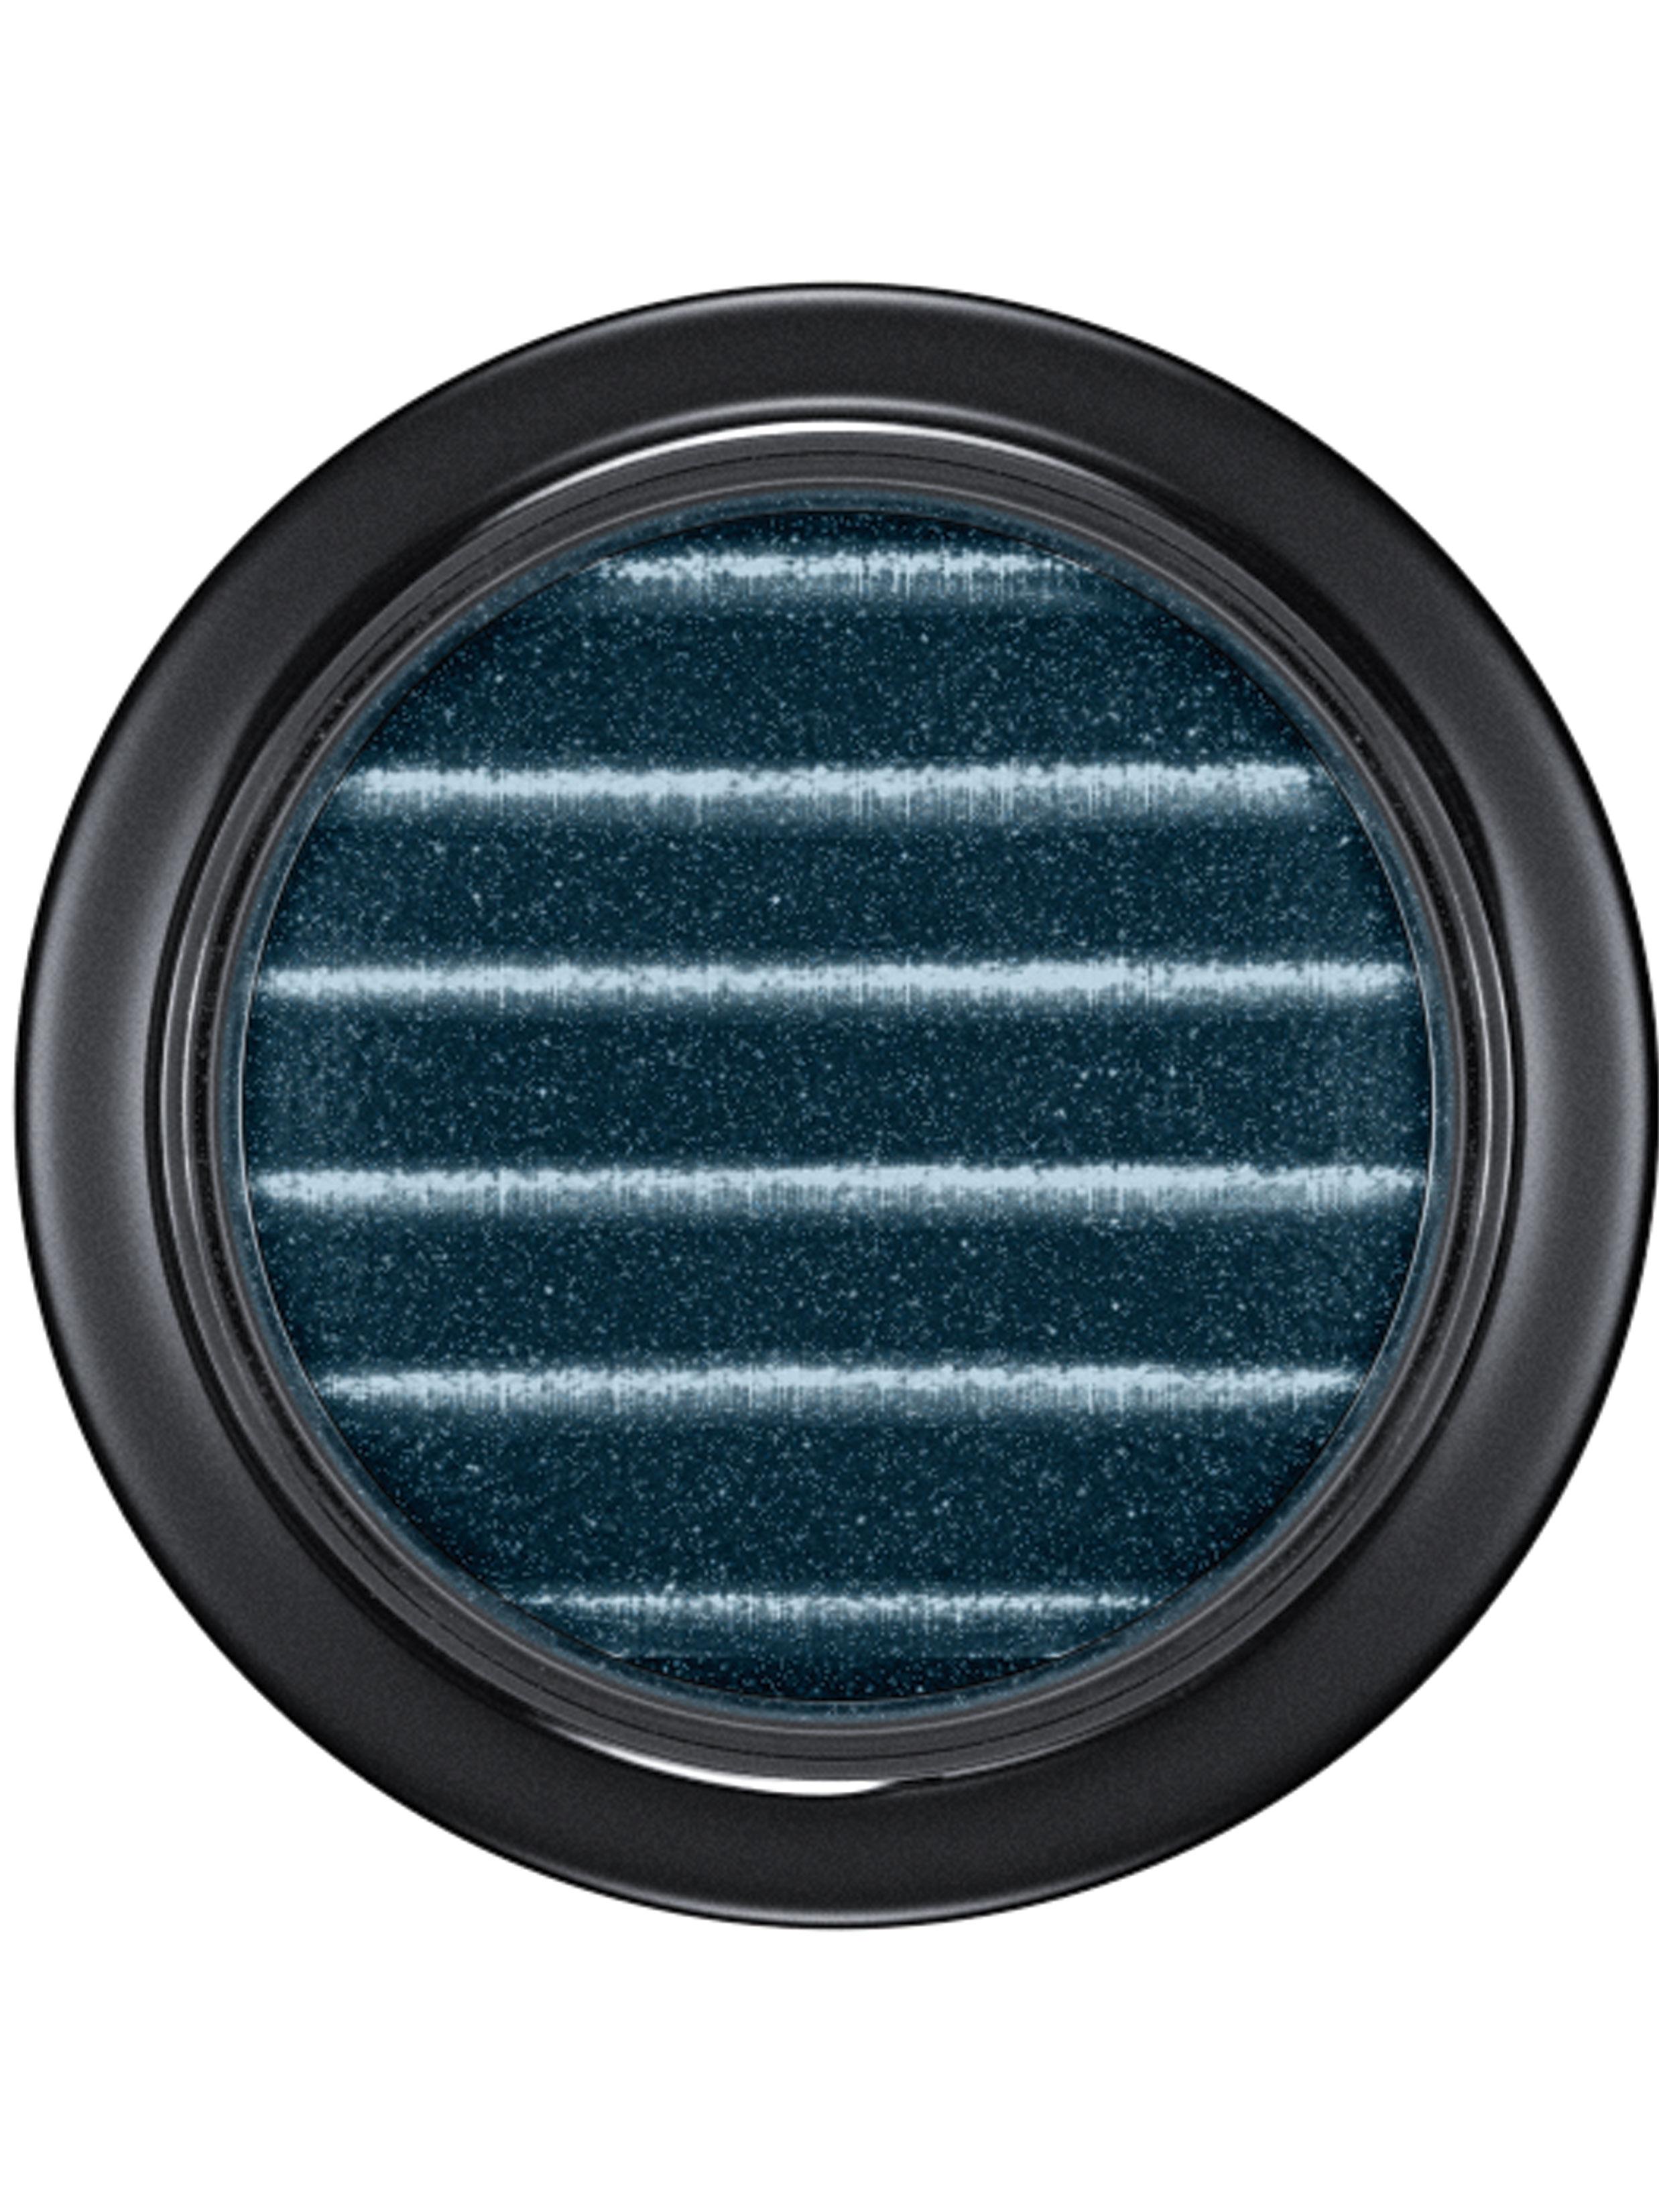 Spellbinder Shadow Blue Karma